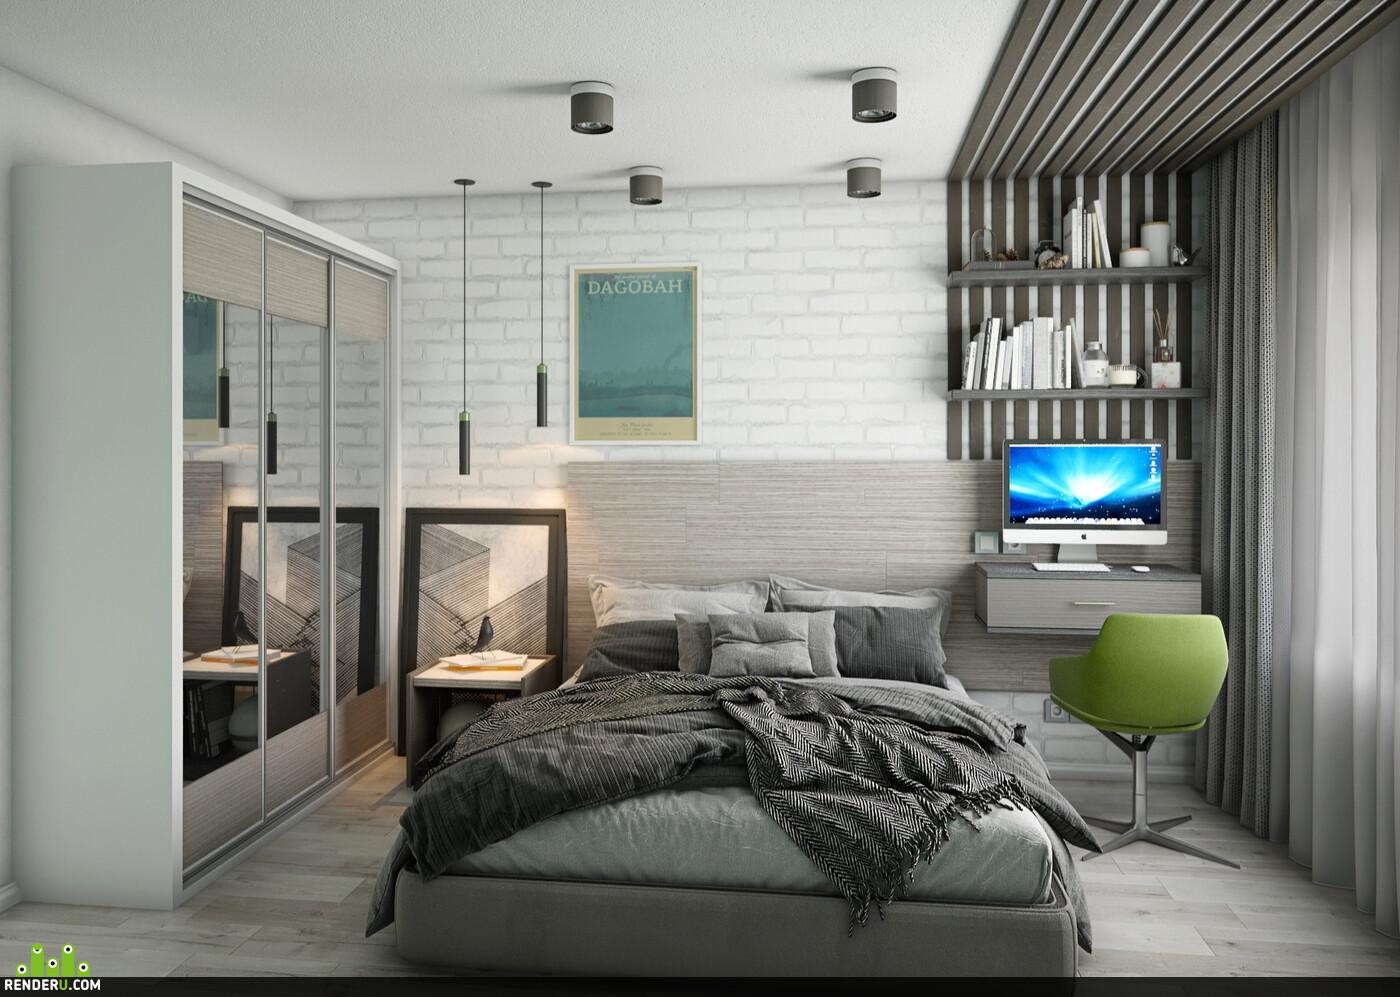 3Dsmax, Vray, render, adobephotoshop, Interior Visualizathion, interior design, interior, bedroom, bedroom design, interior bedroom